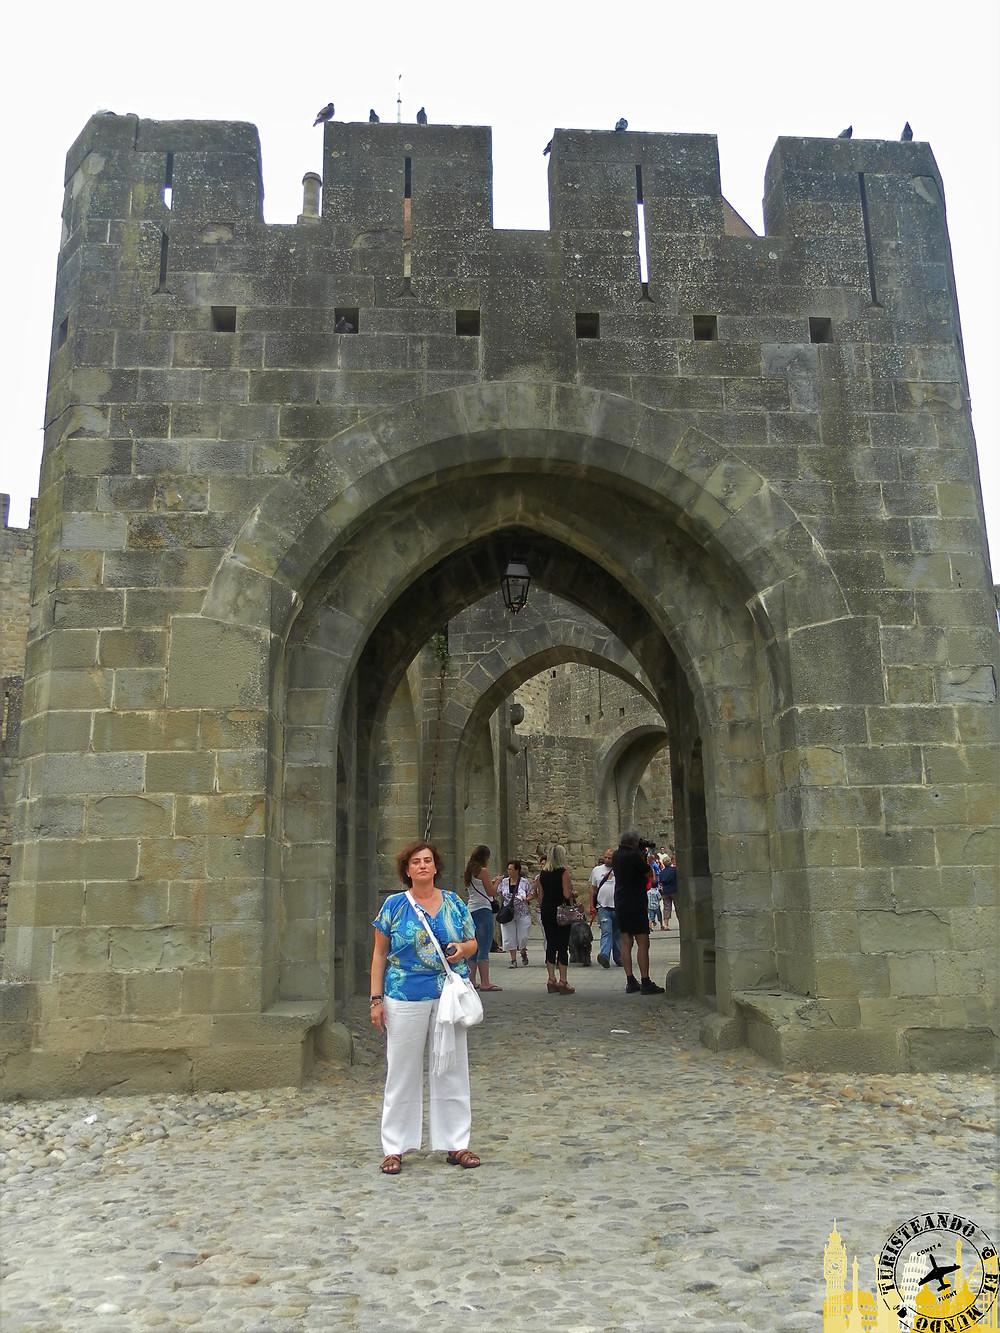 Puerta Narbona. Ciudadela medieval. Carcassonne (Francia)